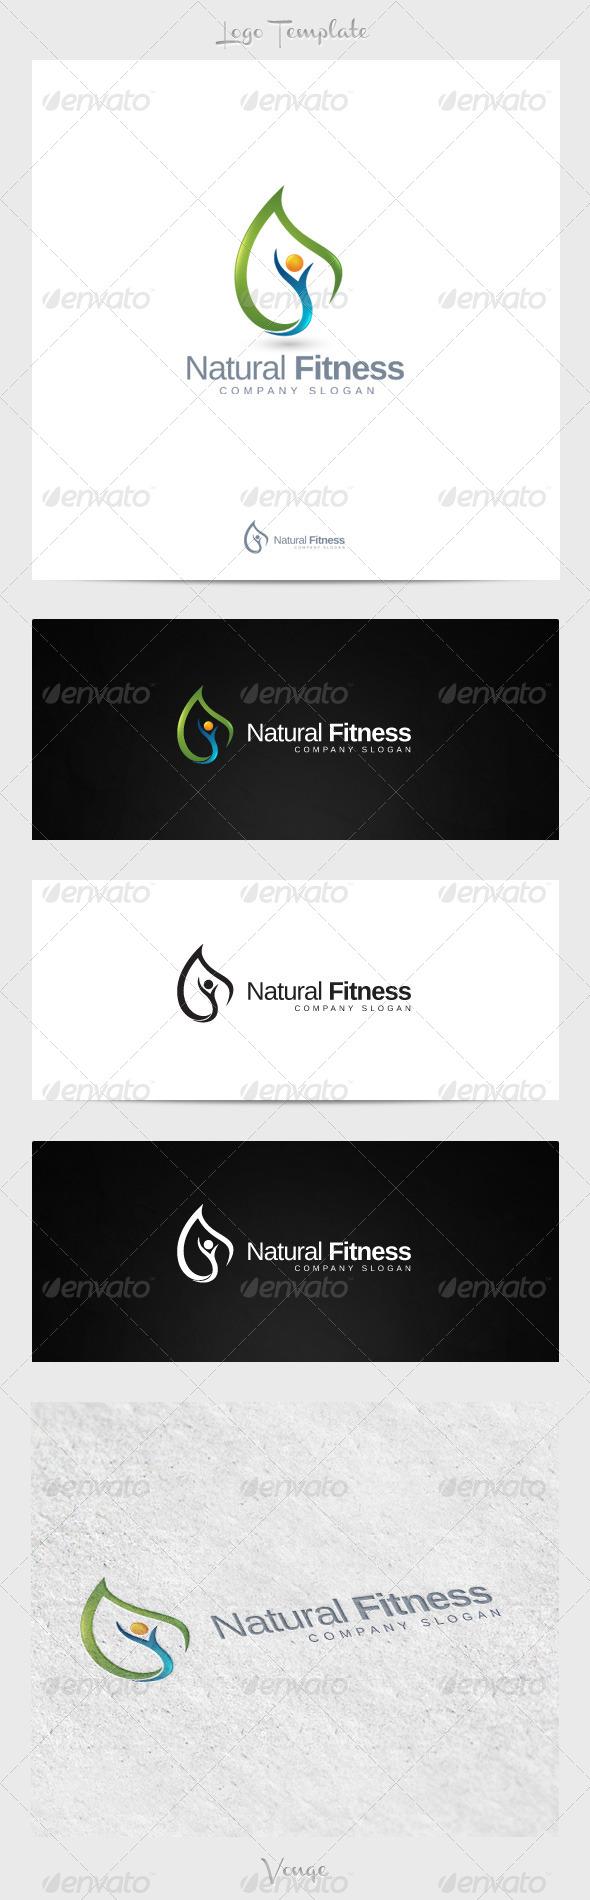 Natural Fitness - Nature Logo Templates